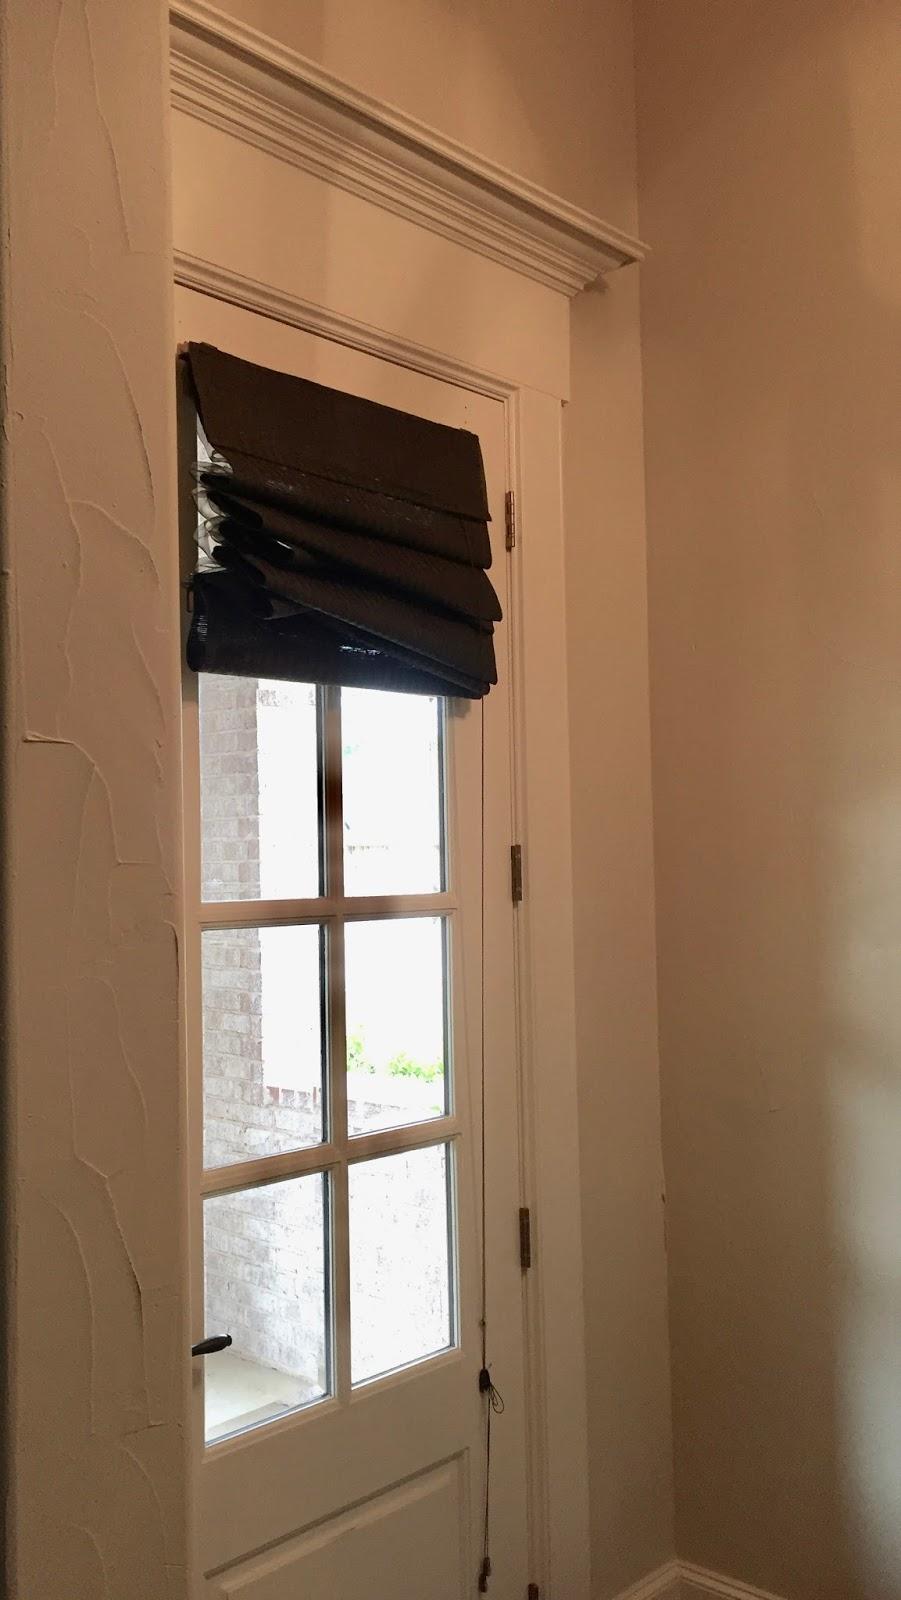 At Rivercrest Cottage: Framing The Windows